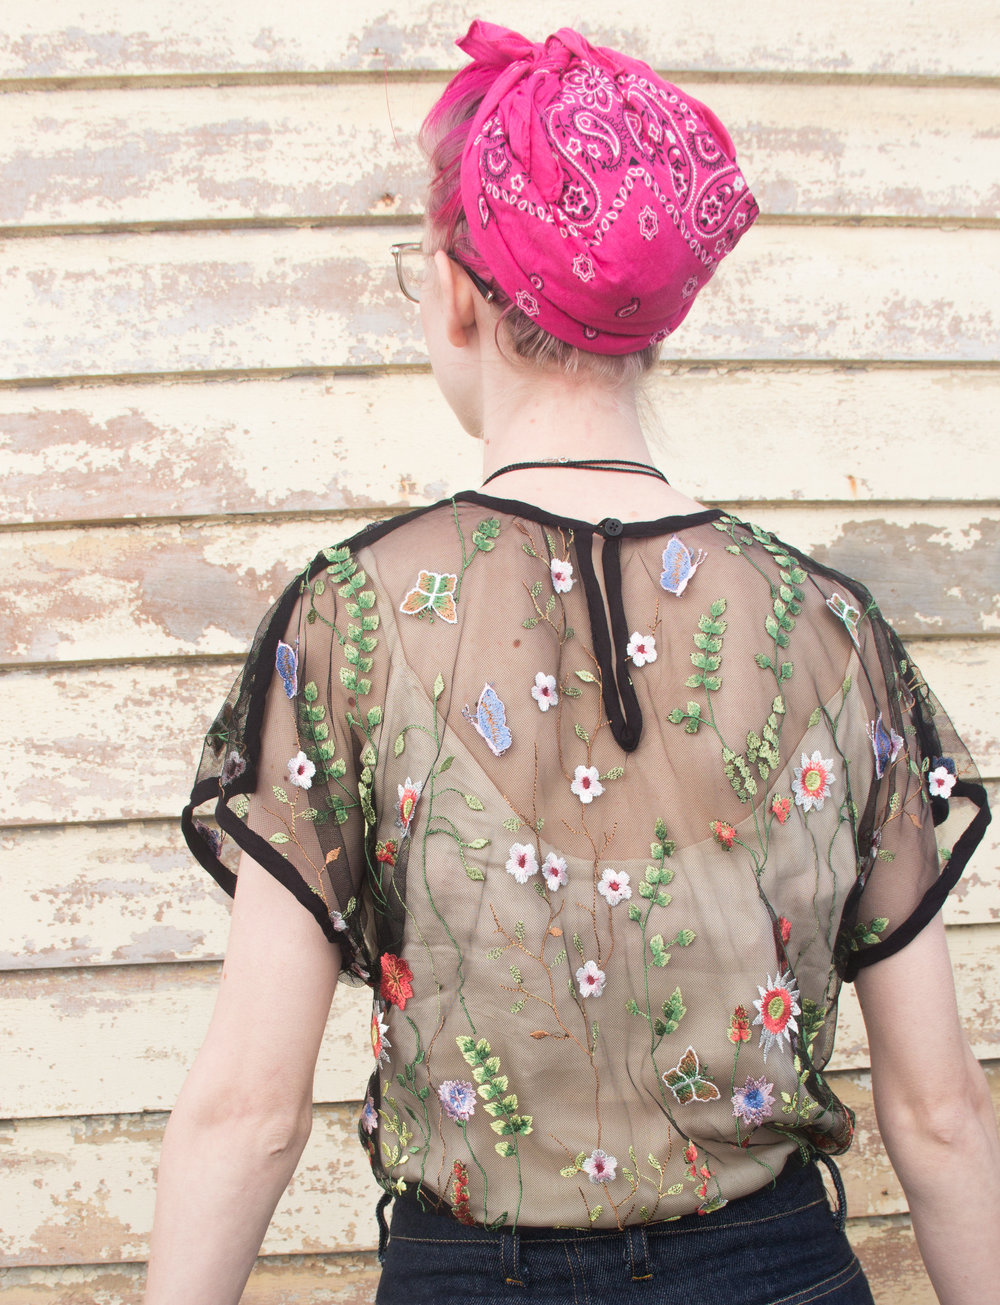 kimono sleeved top